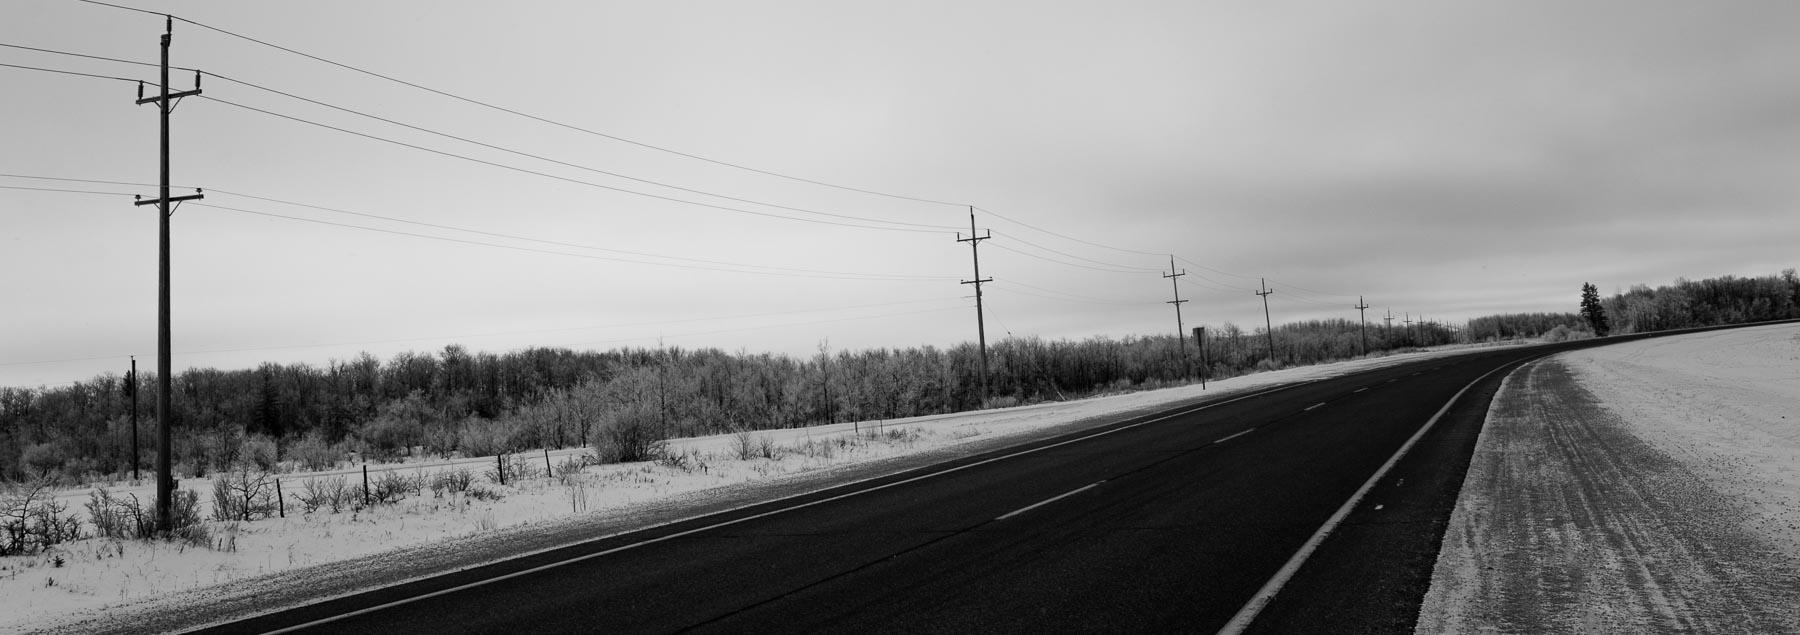 Highway 8, Manitoba, Canada